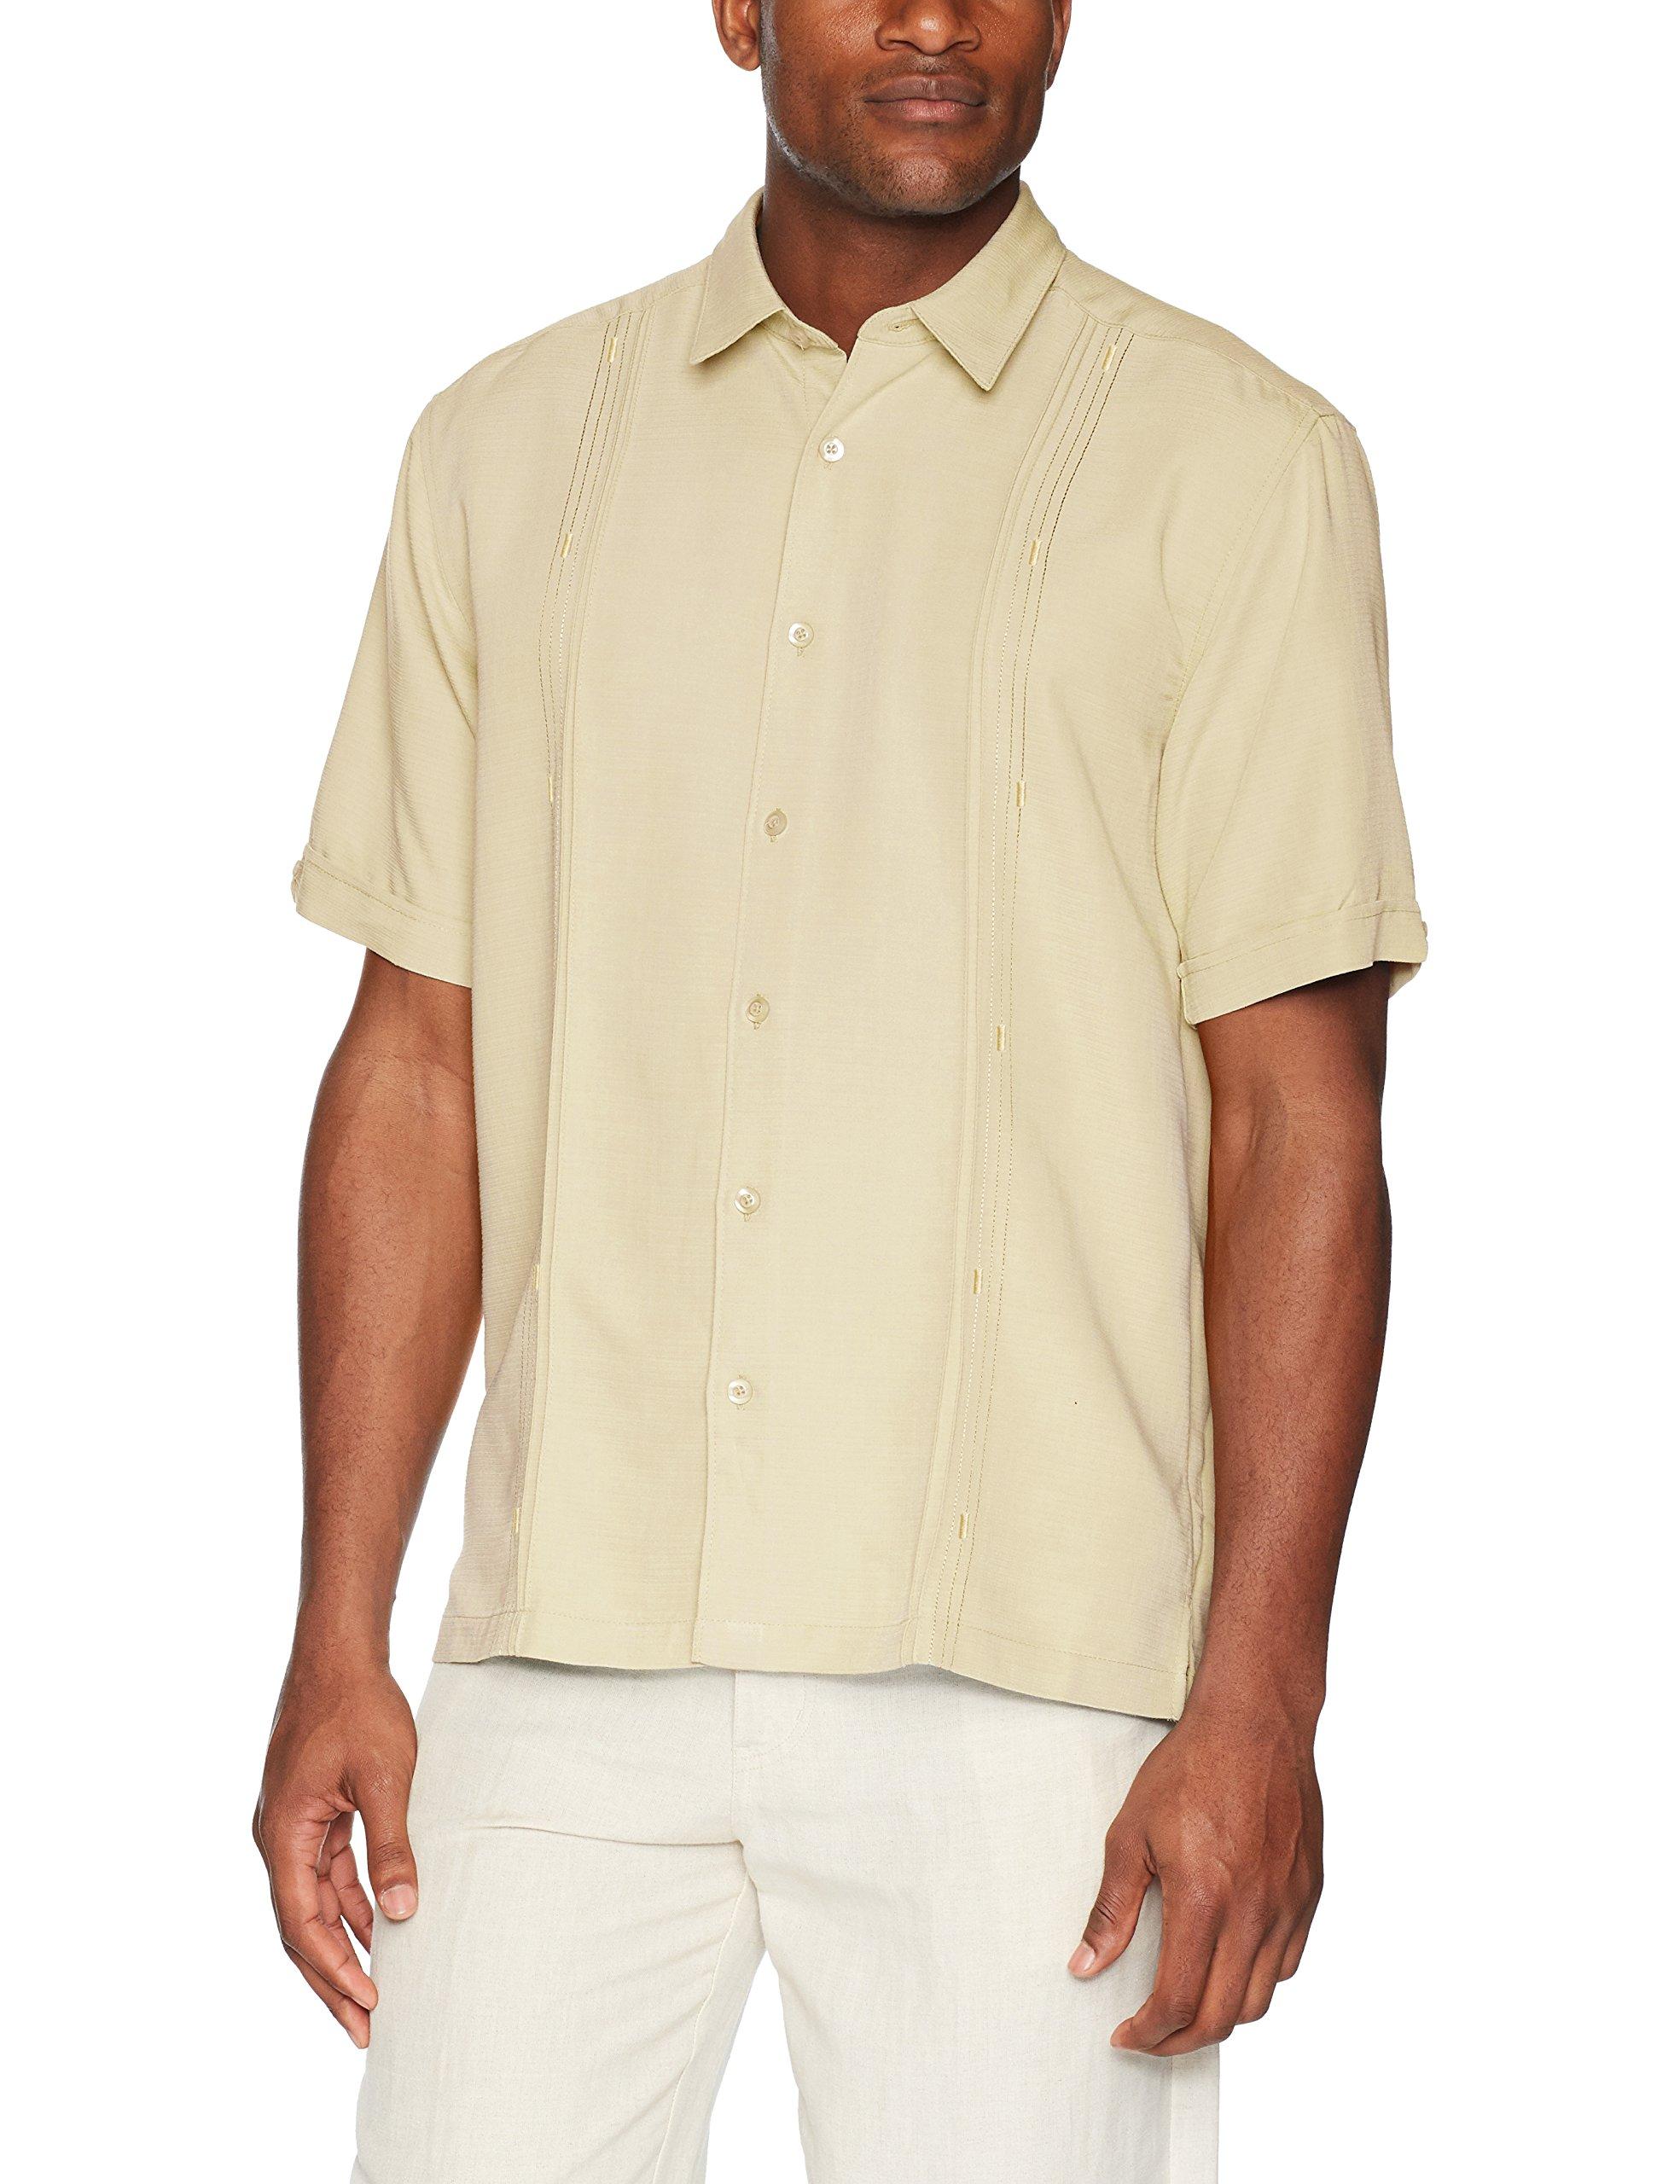 Cubavera Men's Short Sleeve Cuban Camp Shirt Contrast Insert Panels, Banana Crepe Variating Tuck Pattern, Extra Large